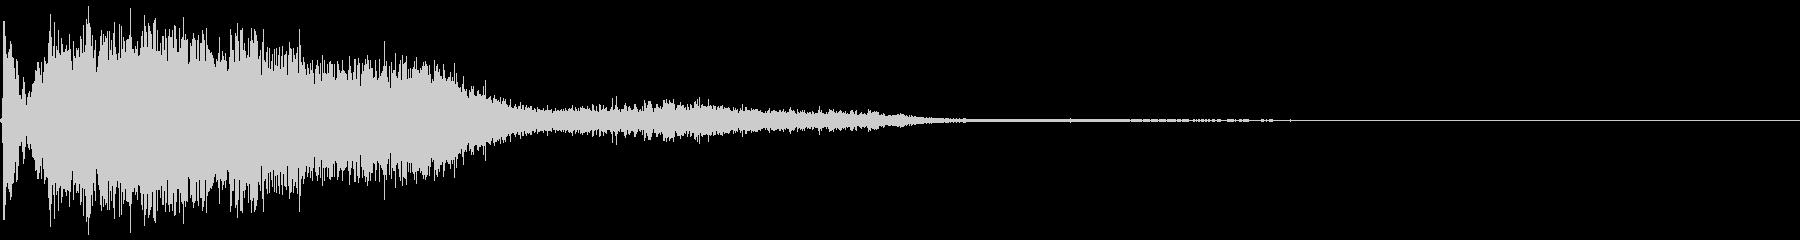 249 FXビーム音(2)の未再生の波形